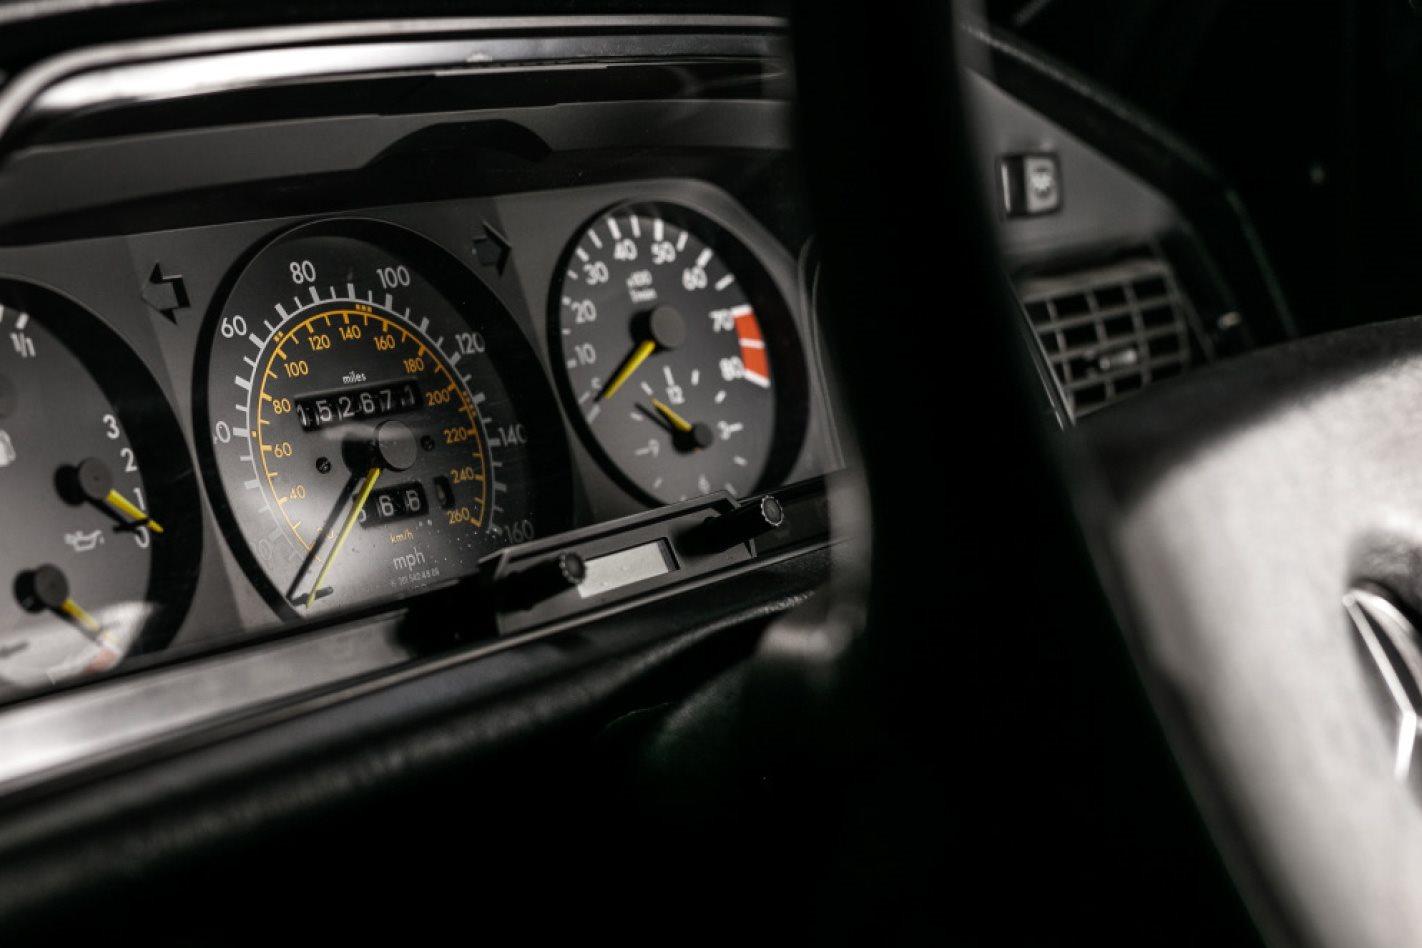 2008 Nissan X Trail Belt Diagram 190class Mercedesbenz Cars